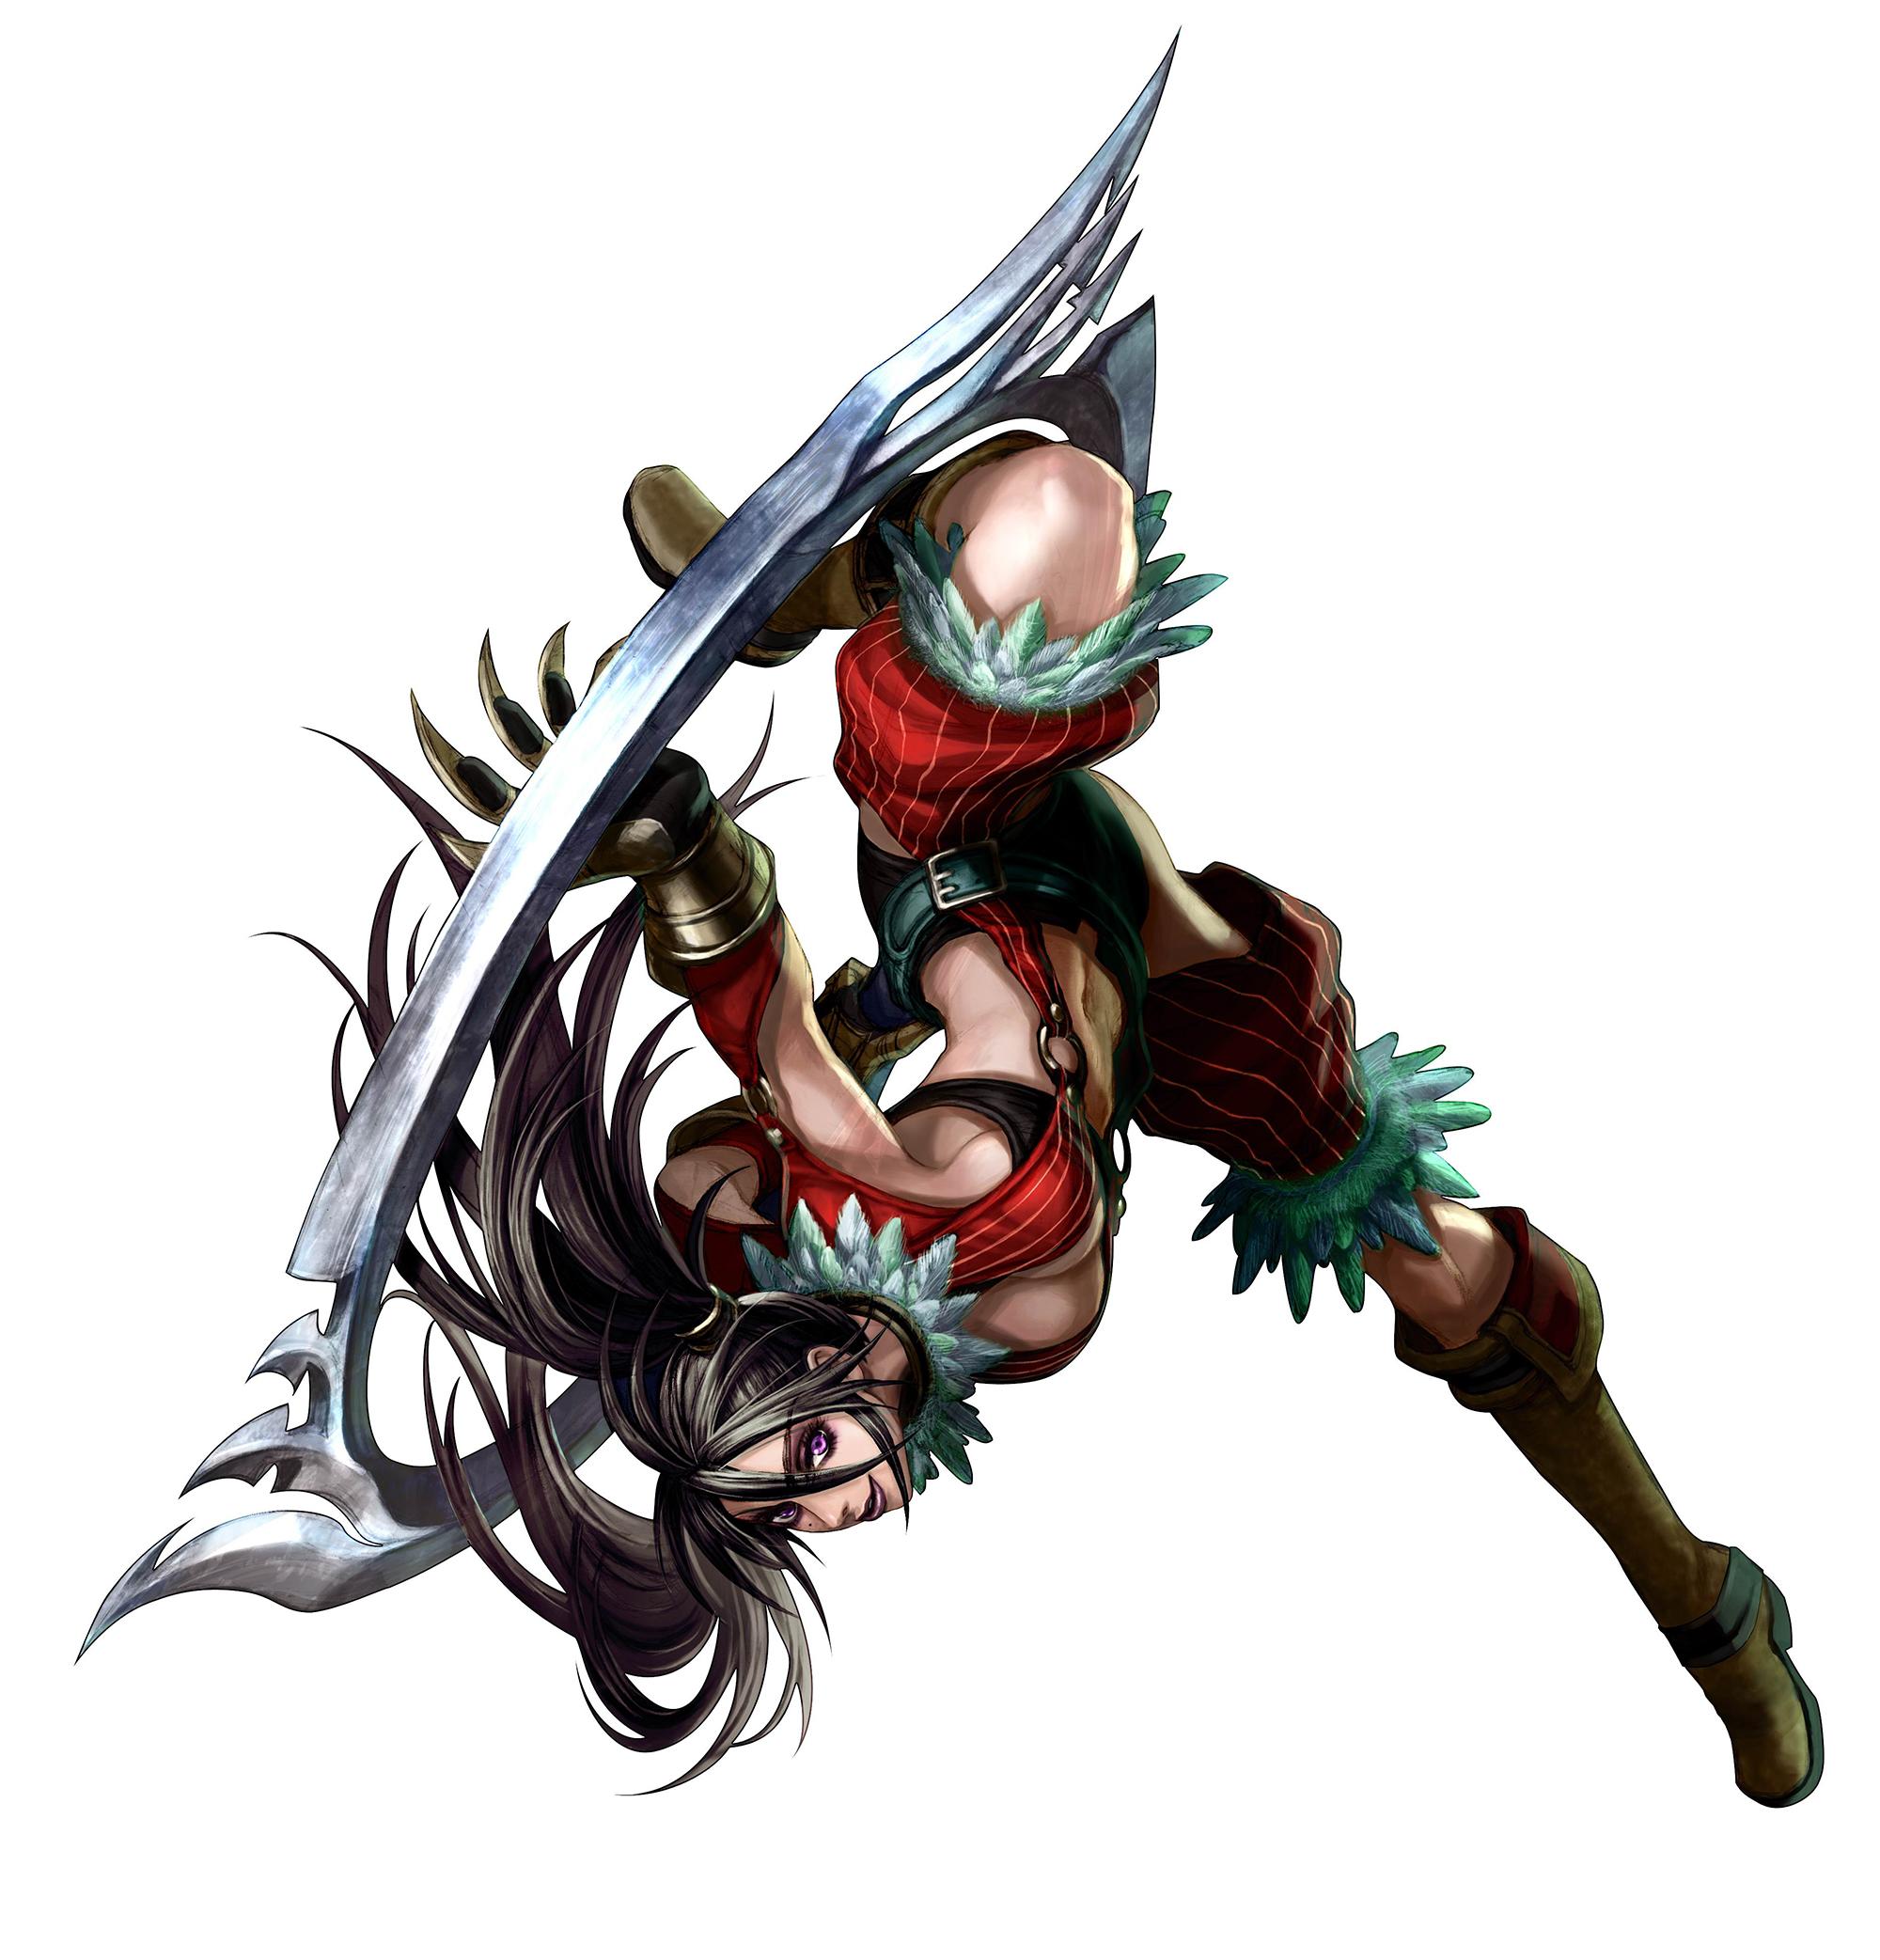 Warriors Orochi 4 Soul Calibur: Official Soul Calibur 4 Character List